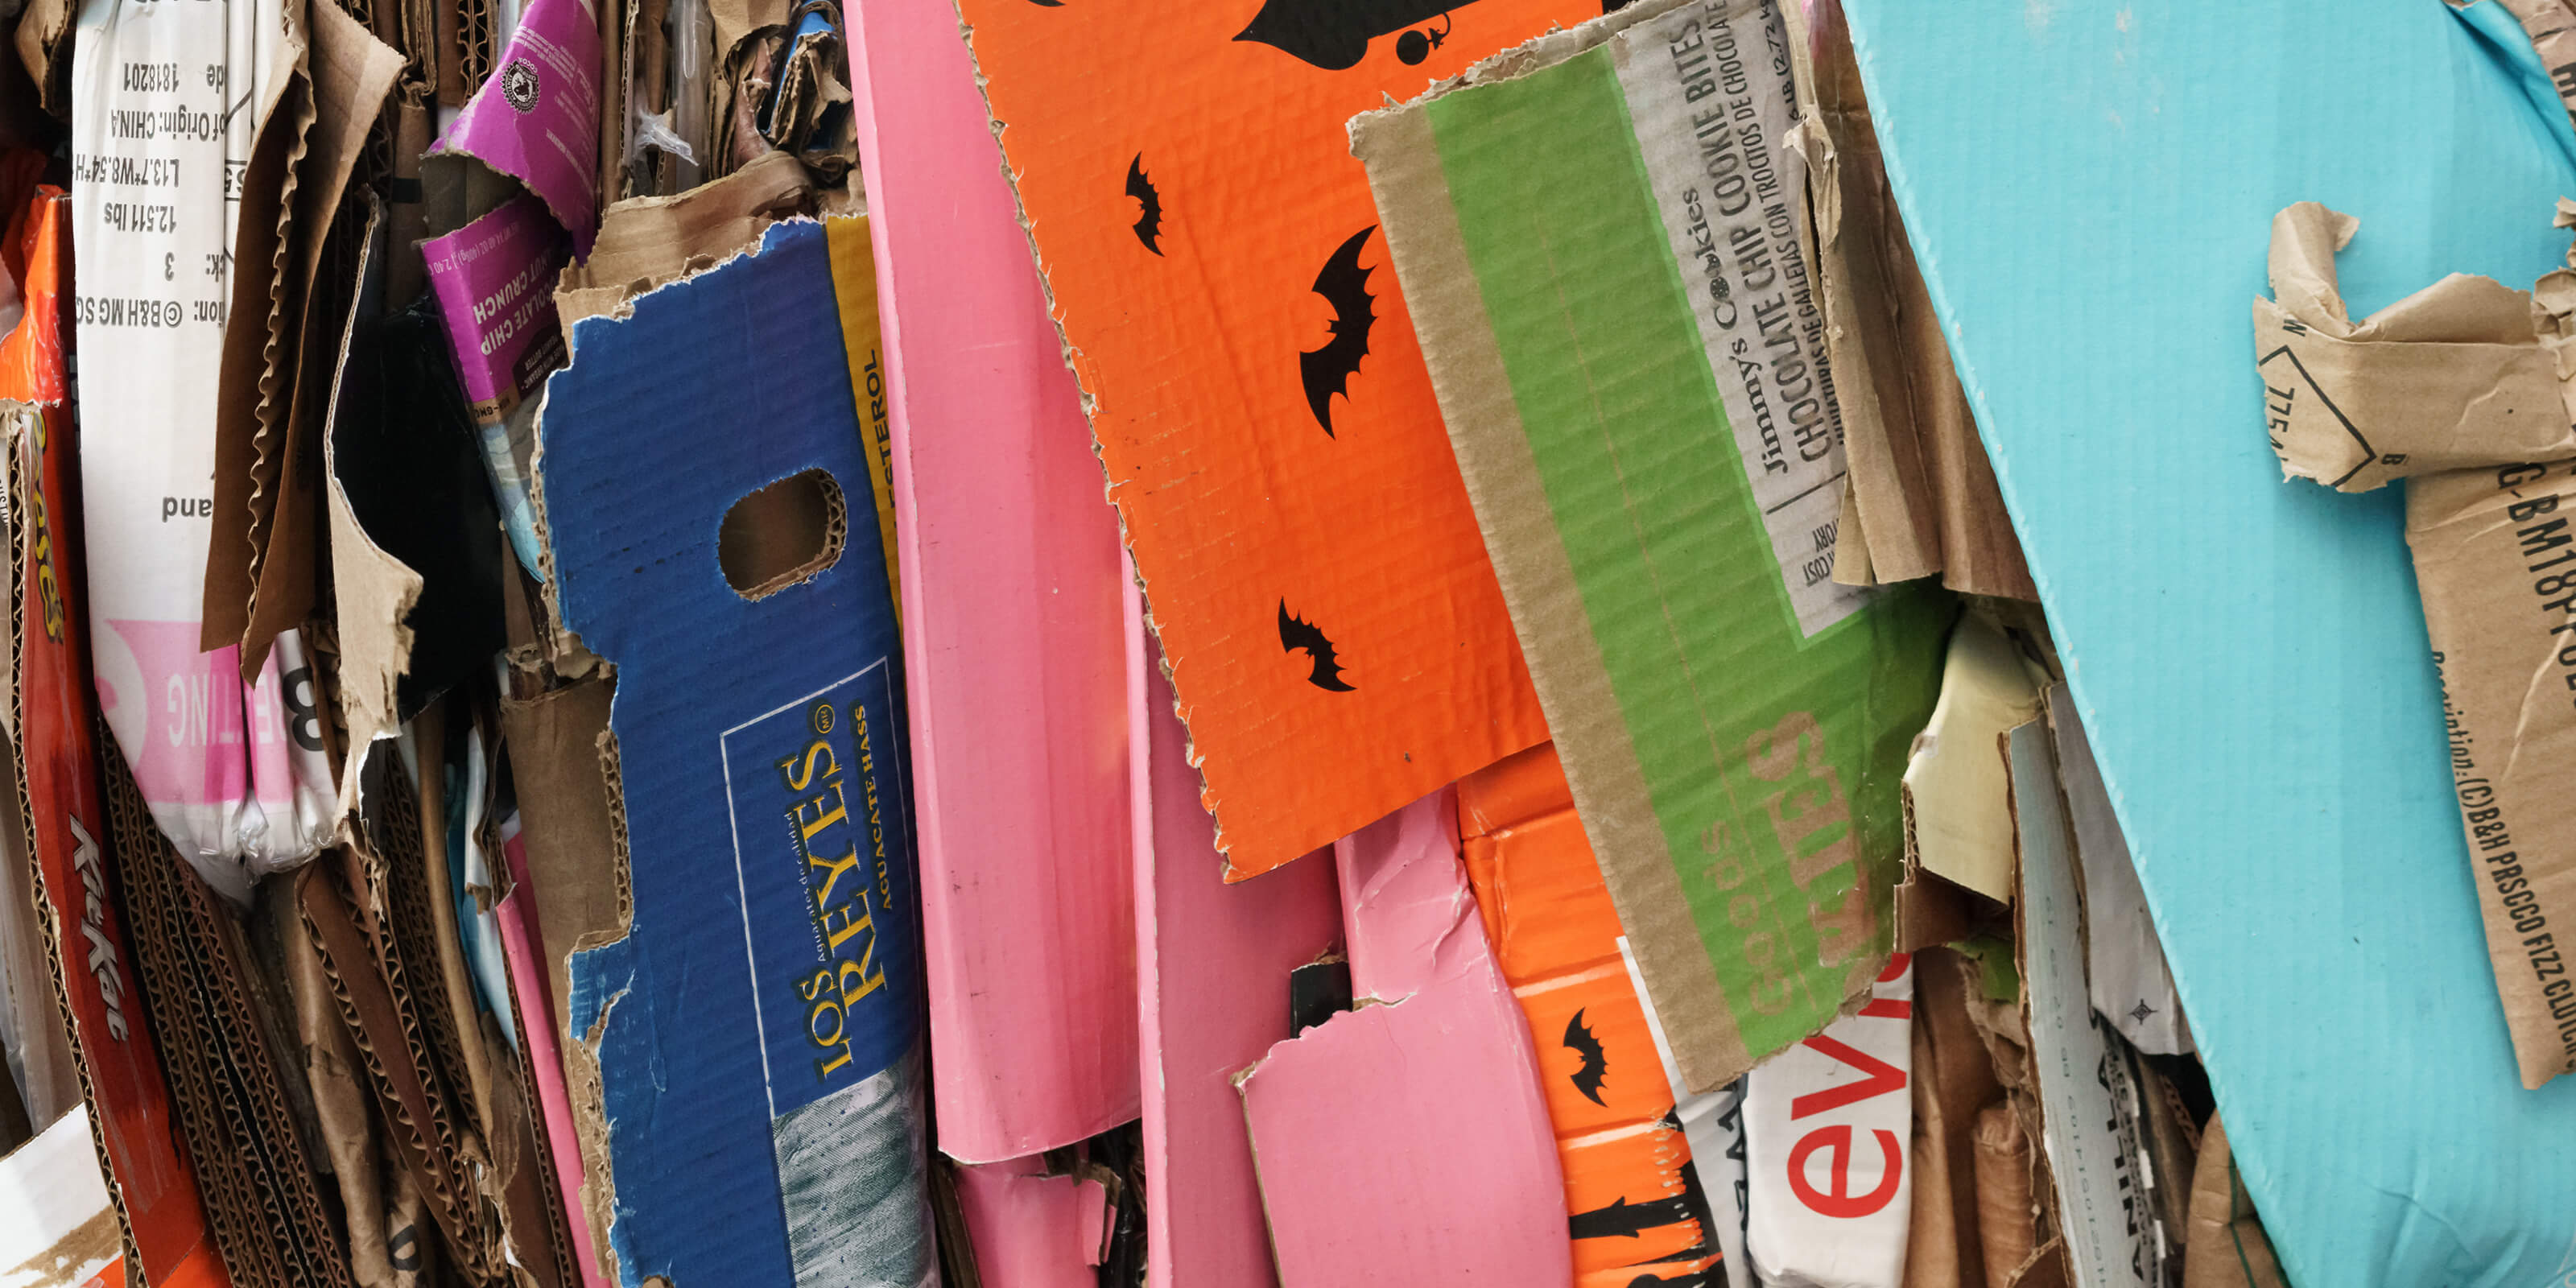 folded cardboard boxes